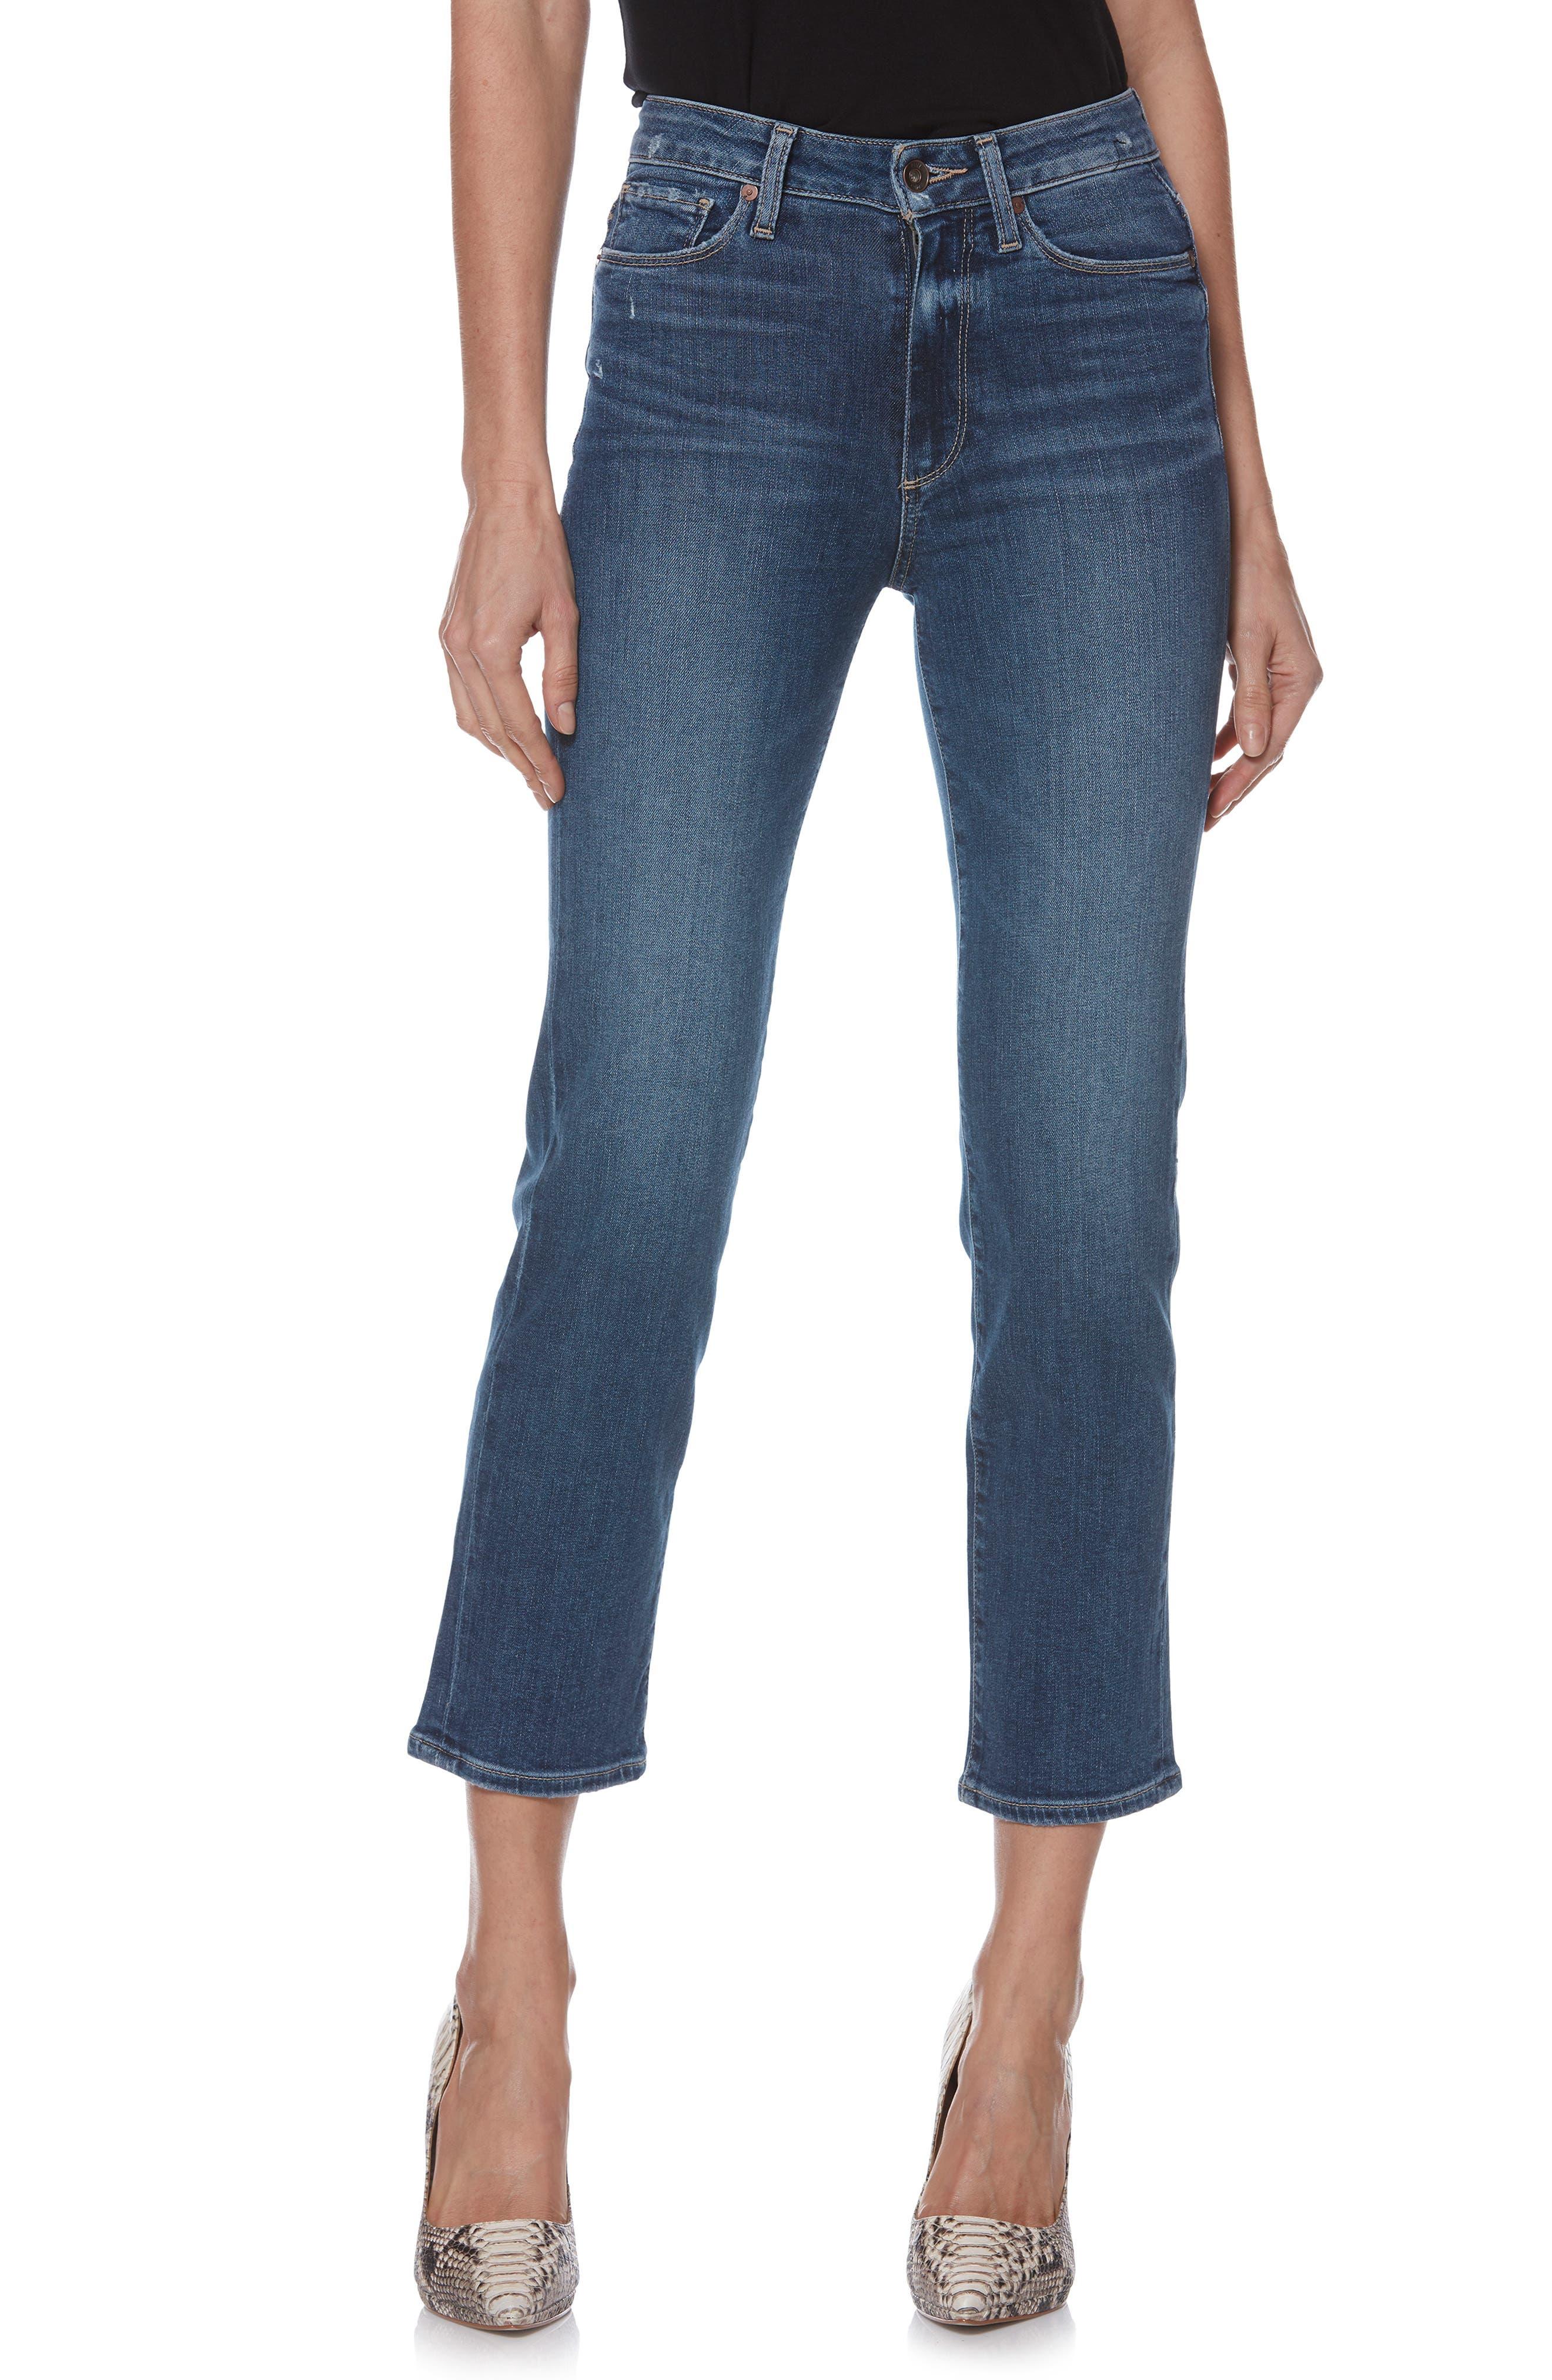 Transcend Vintage - Margot High Waist Ankle Straight Leg Jeans,                         Main,                         color, HANNIE